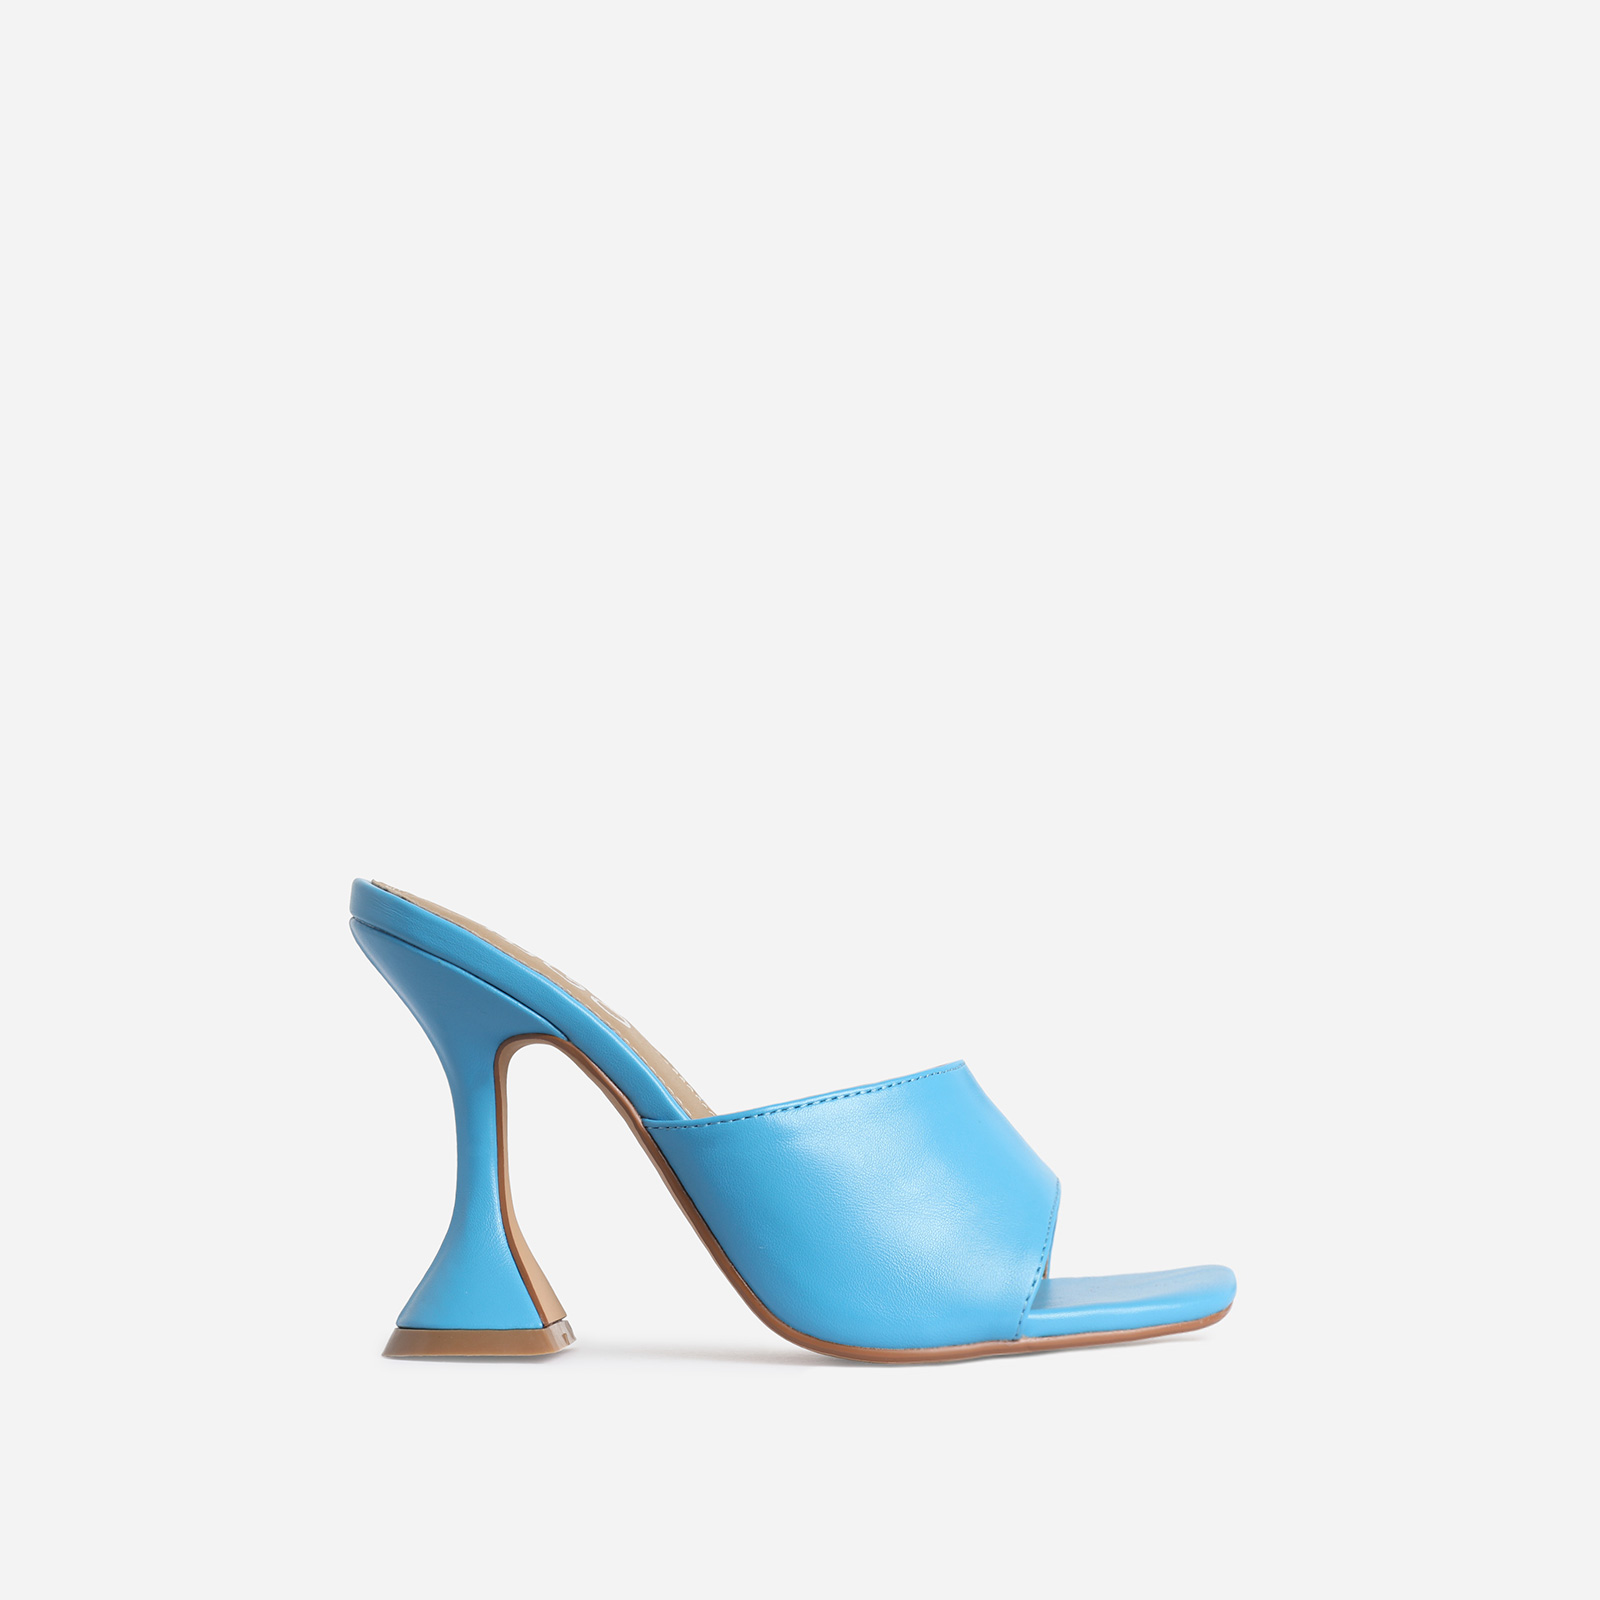 Jordi Peep Square Toe Heel Mule In Blue Faux Leather